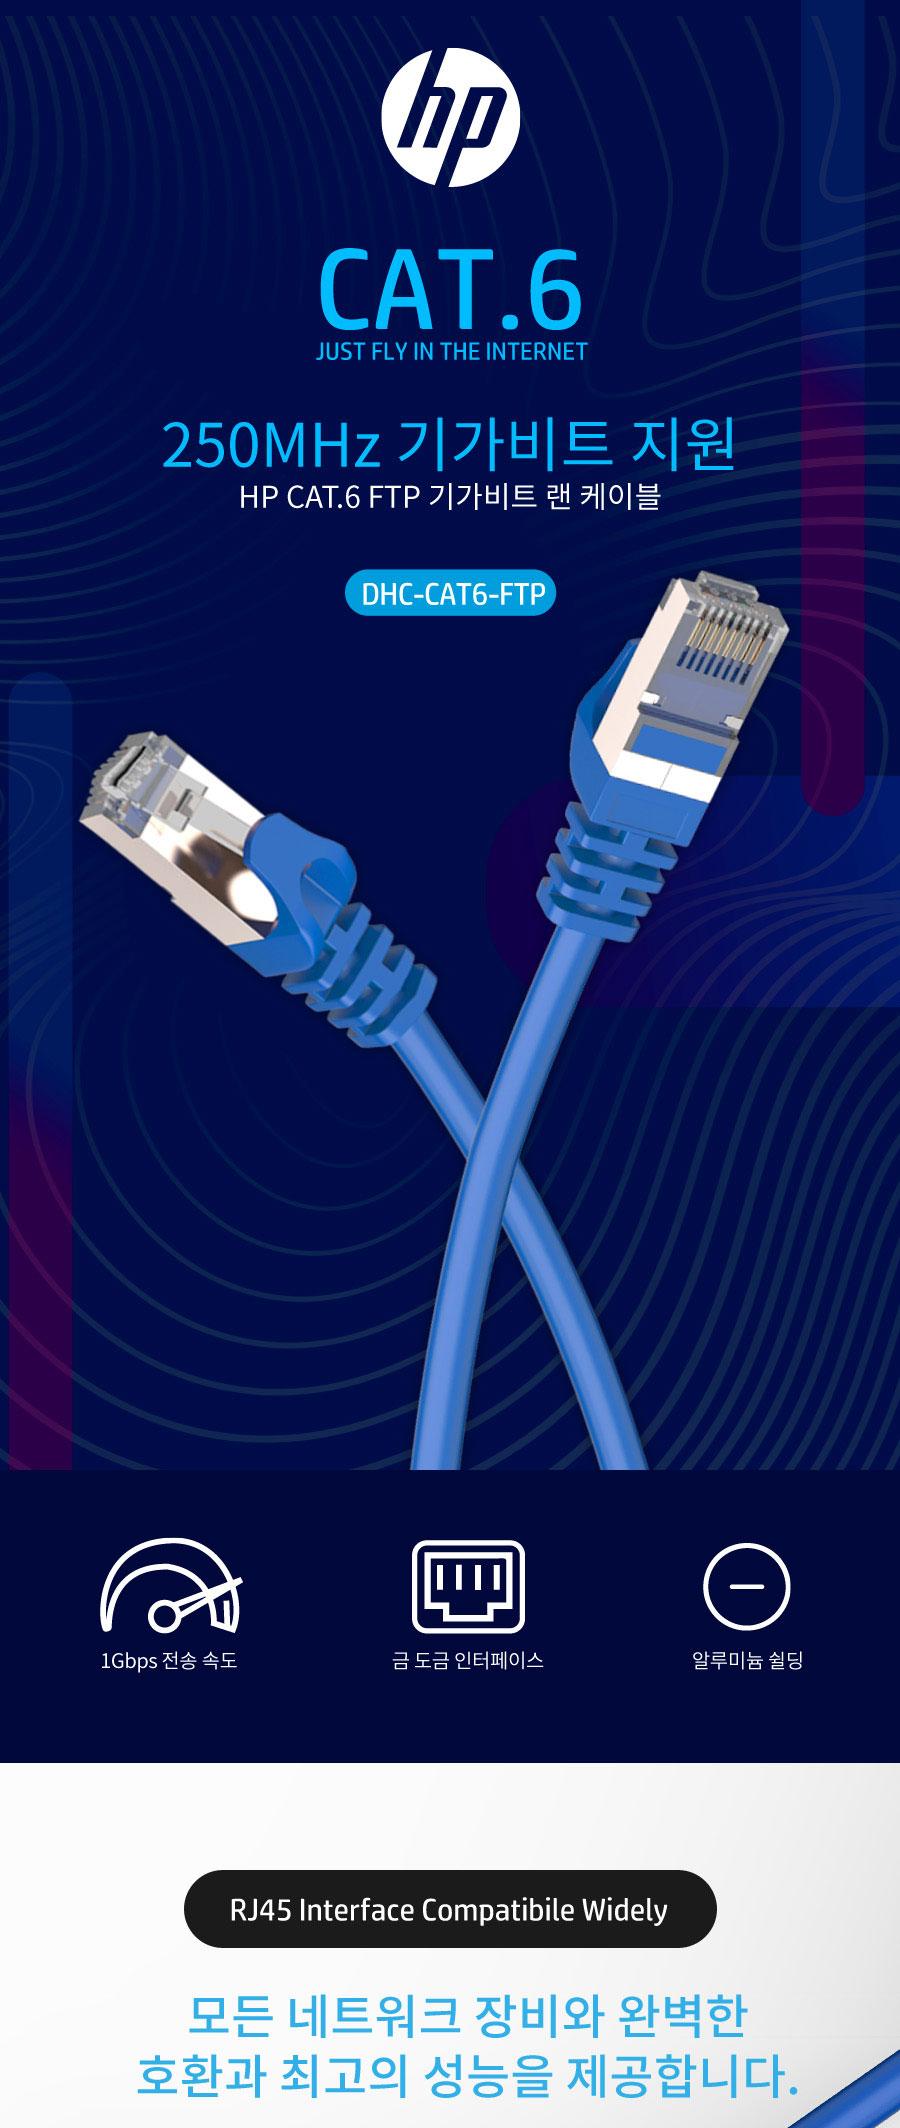 HP DHC-CAT6-FTP CAT.6 FTP 랜케이블 (1m)